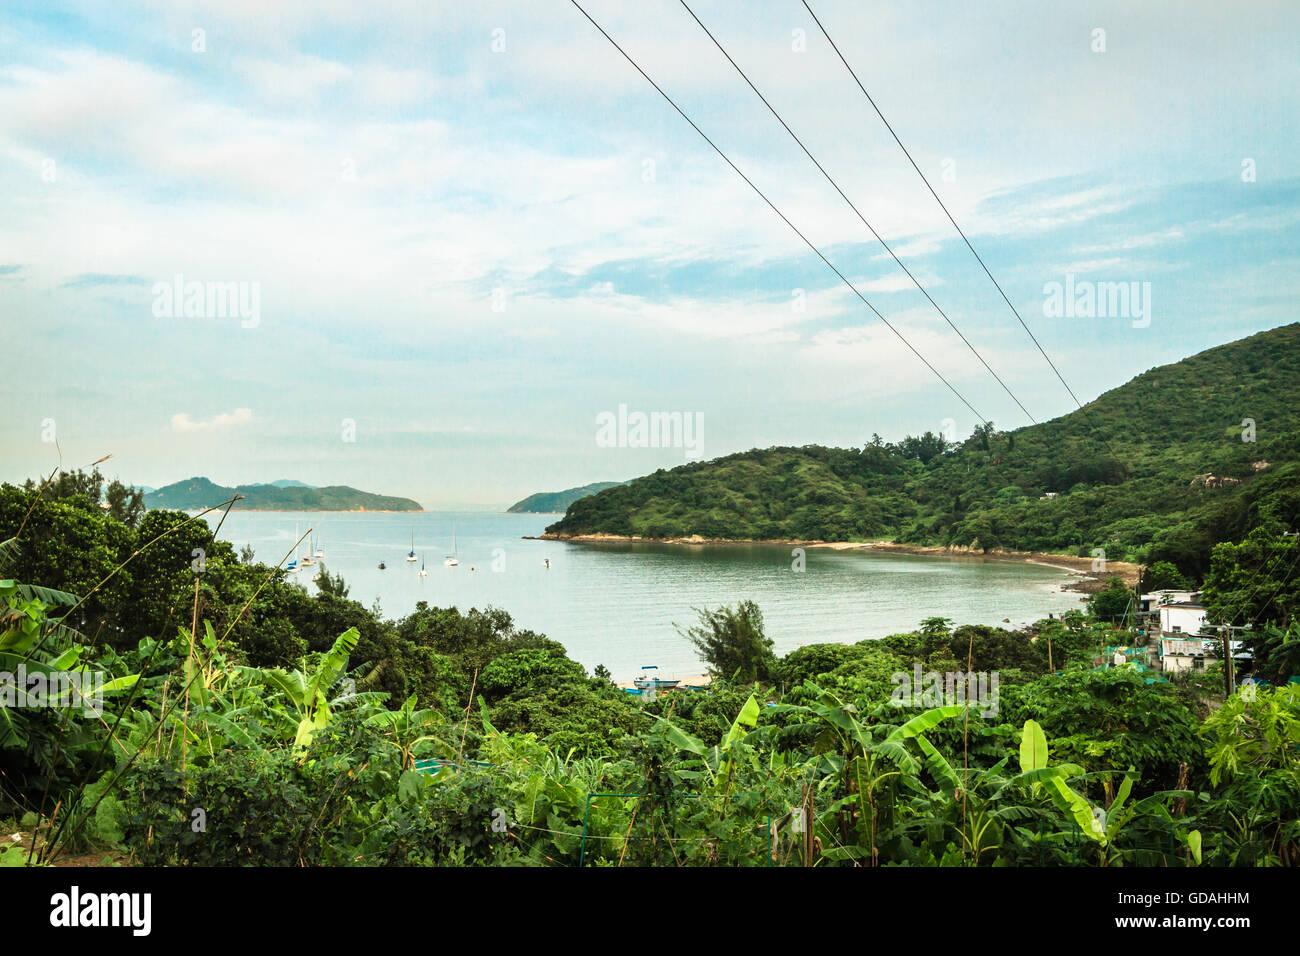 Lush green beach with tropical plants on Lantau Island, Hong Kong - Stock Image